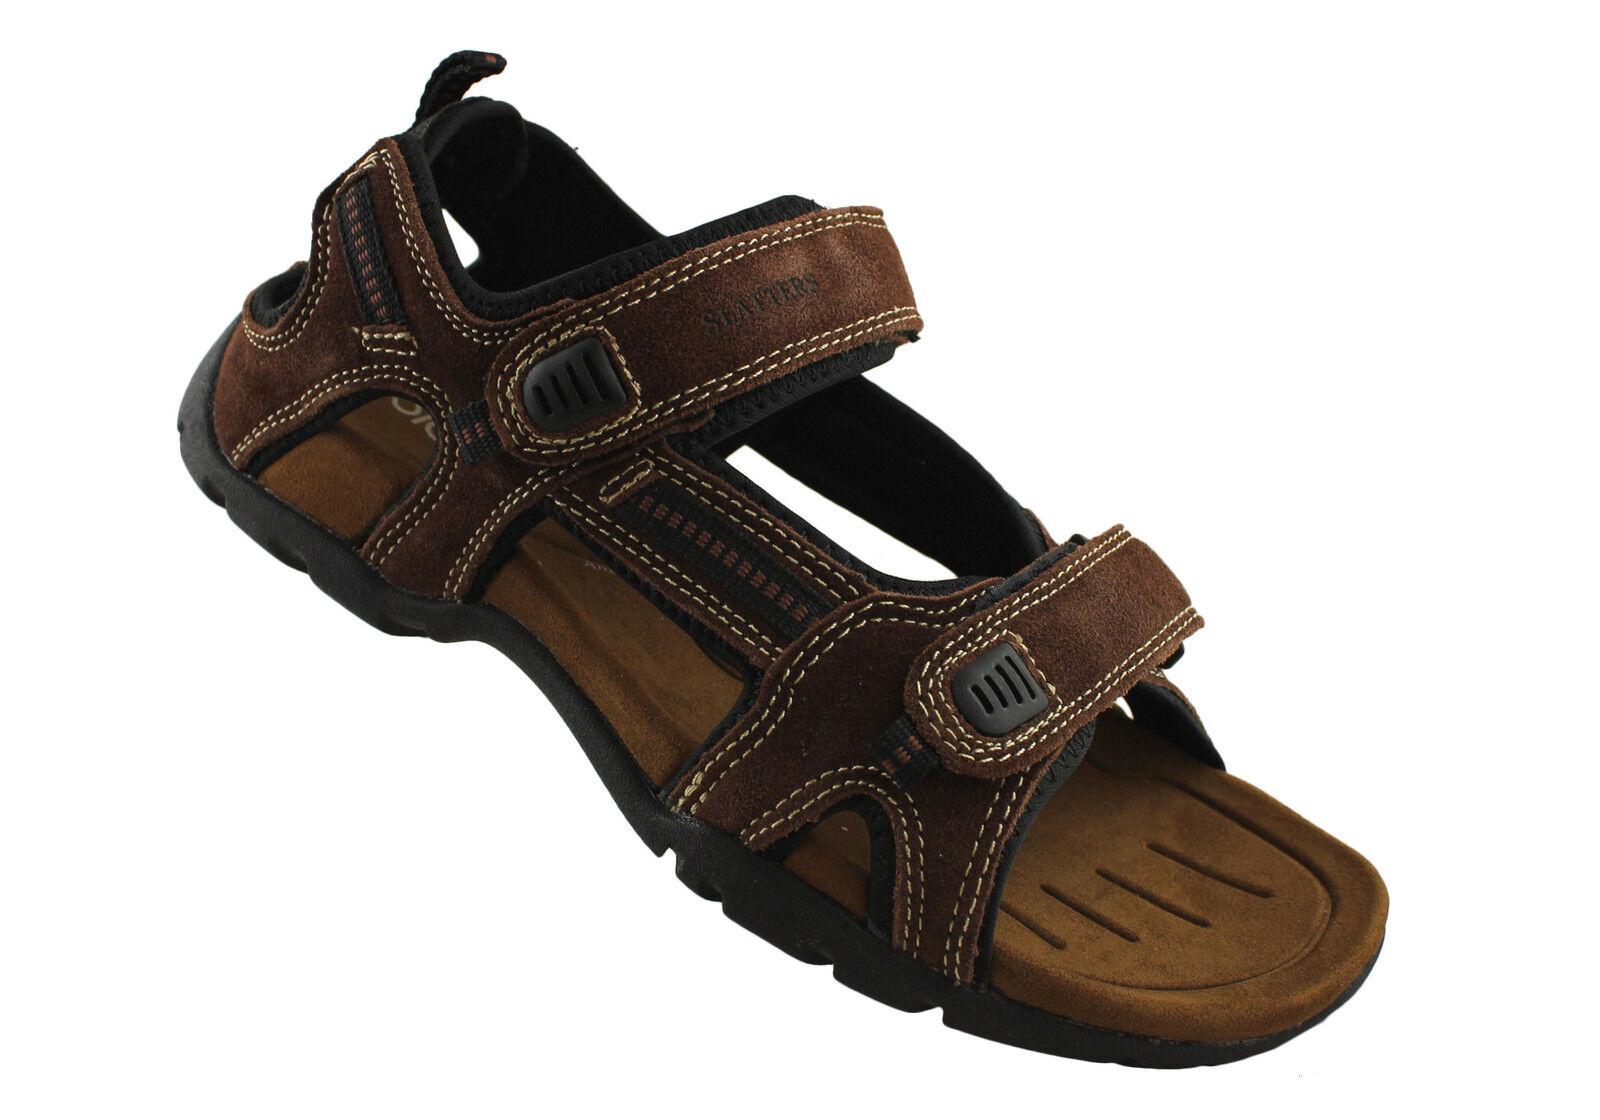 18b02564374 ... Sandal leather adjustable strap walking shoe mens Slatters Broome II  e0c178 ...